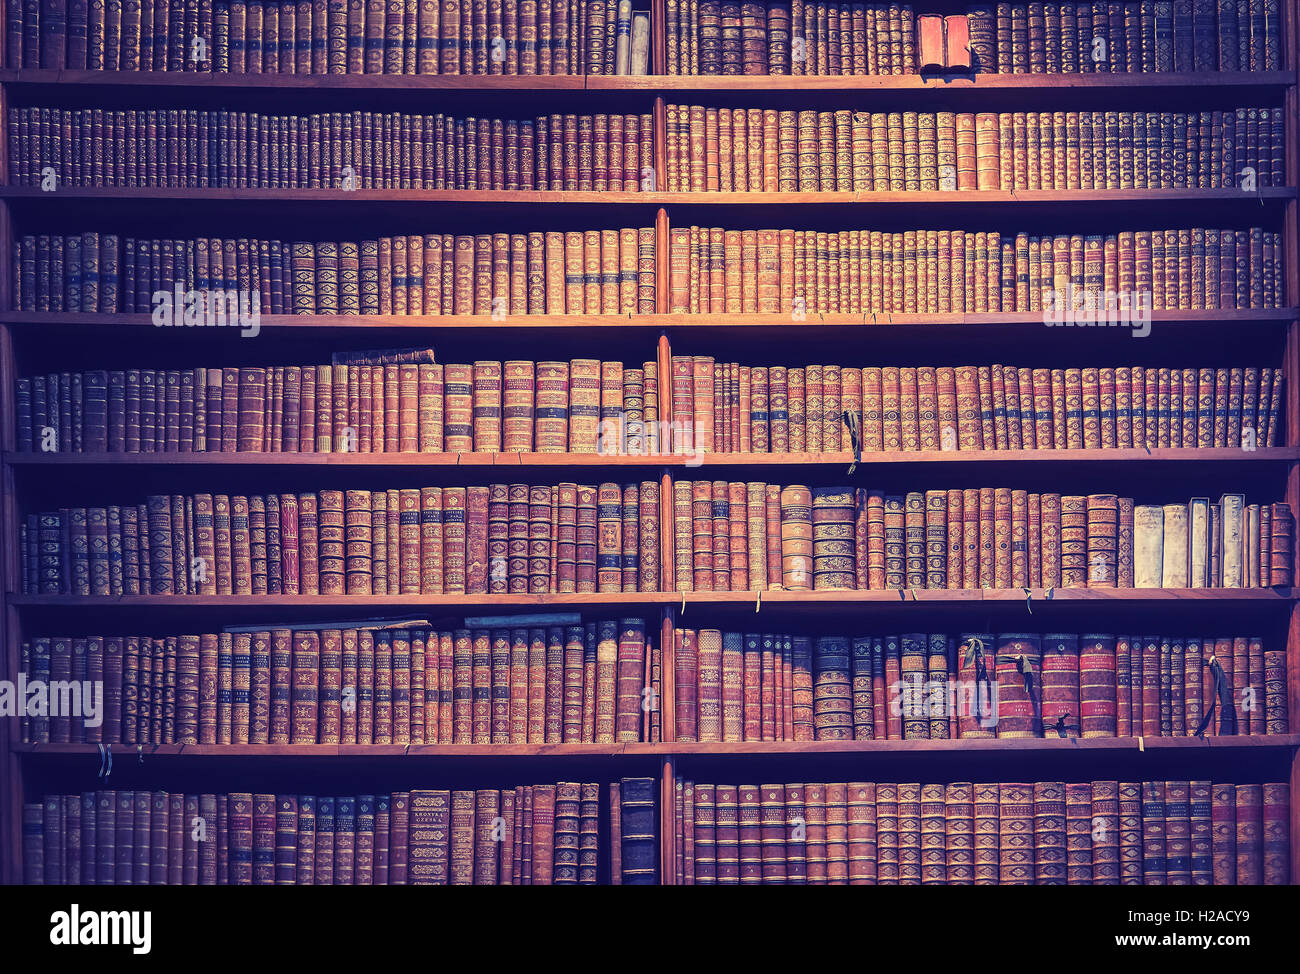 Vintage toned old books on wooden shelves, wisdom concept background. - Stock Image